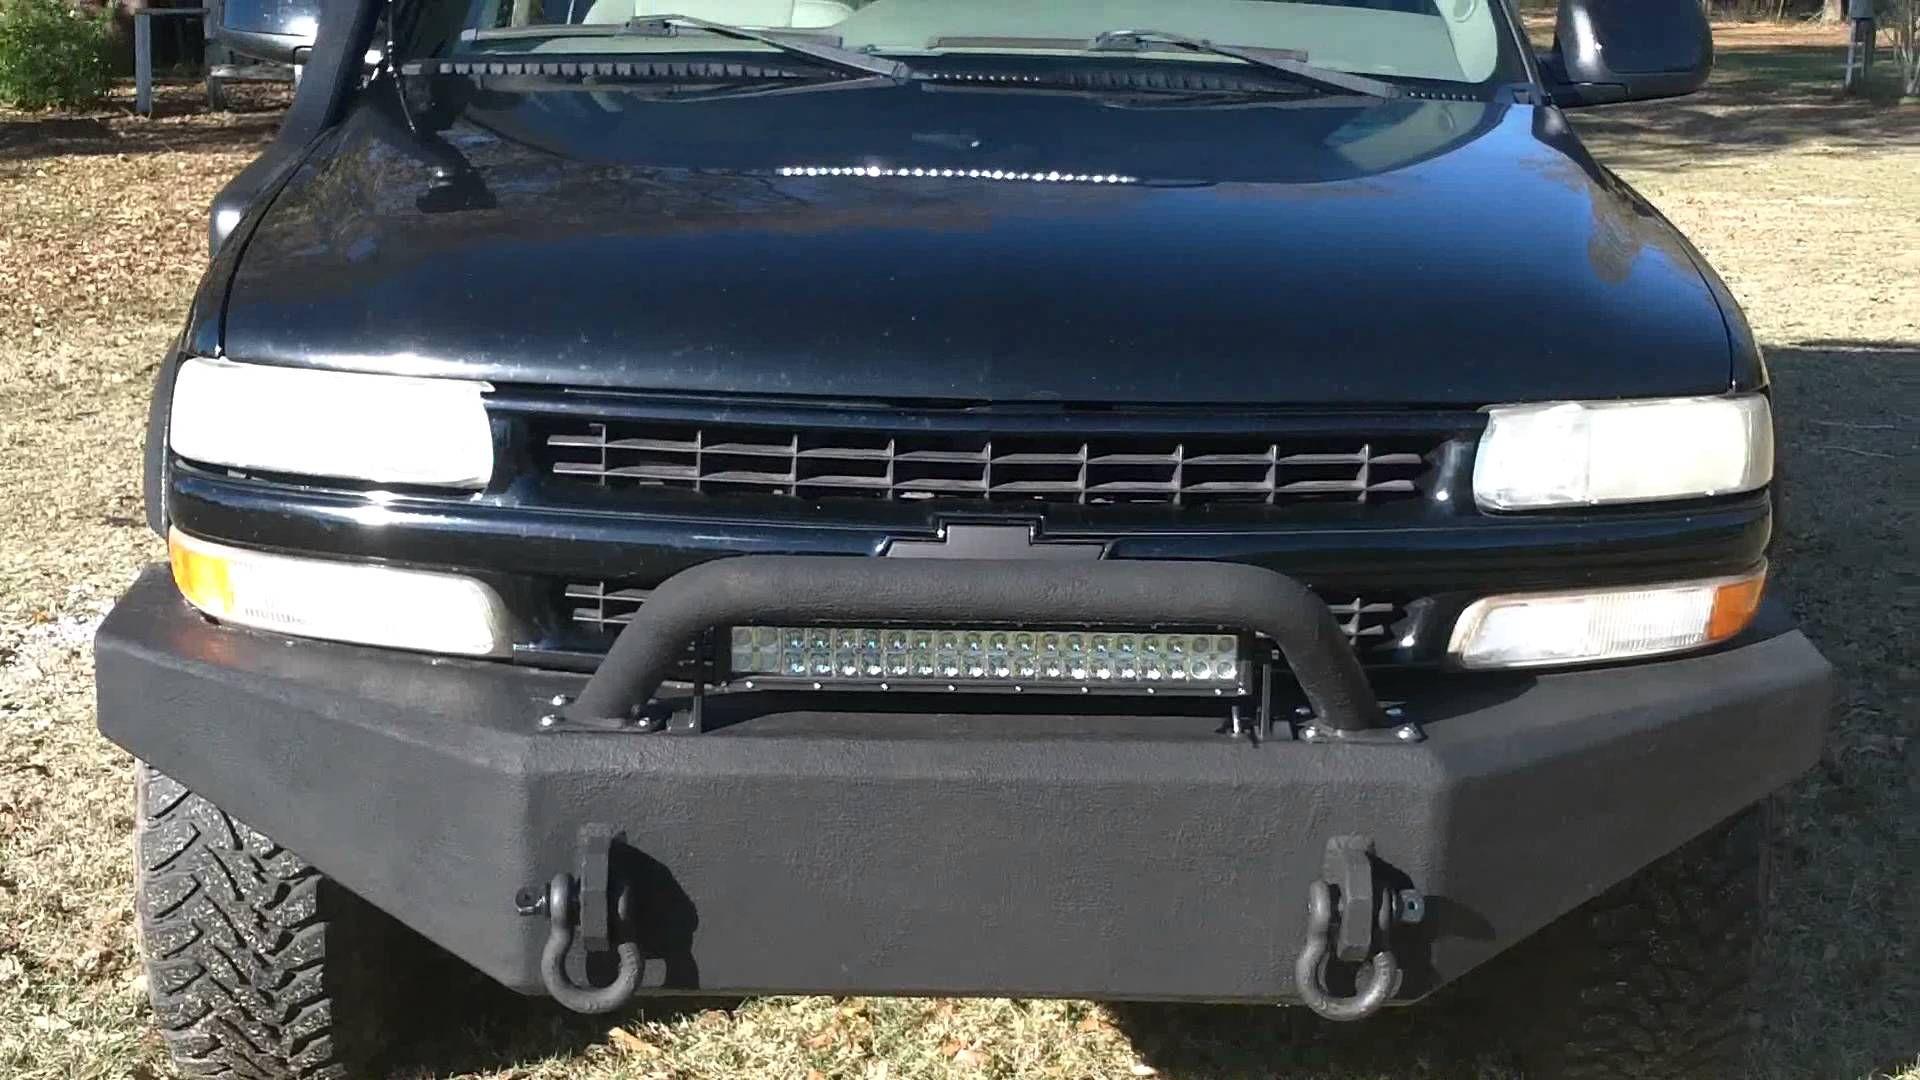 2003 chevy tahoe z71 custom bumpers rock sliders roof rack snorkel a  [ 1920 x 1080 Pixel ]